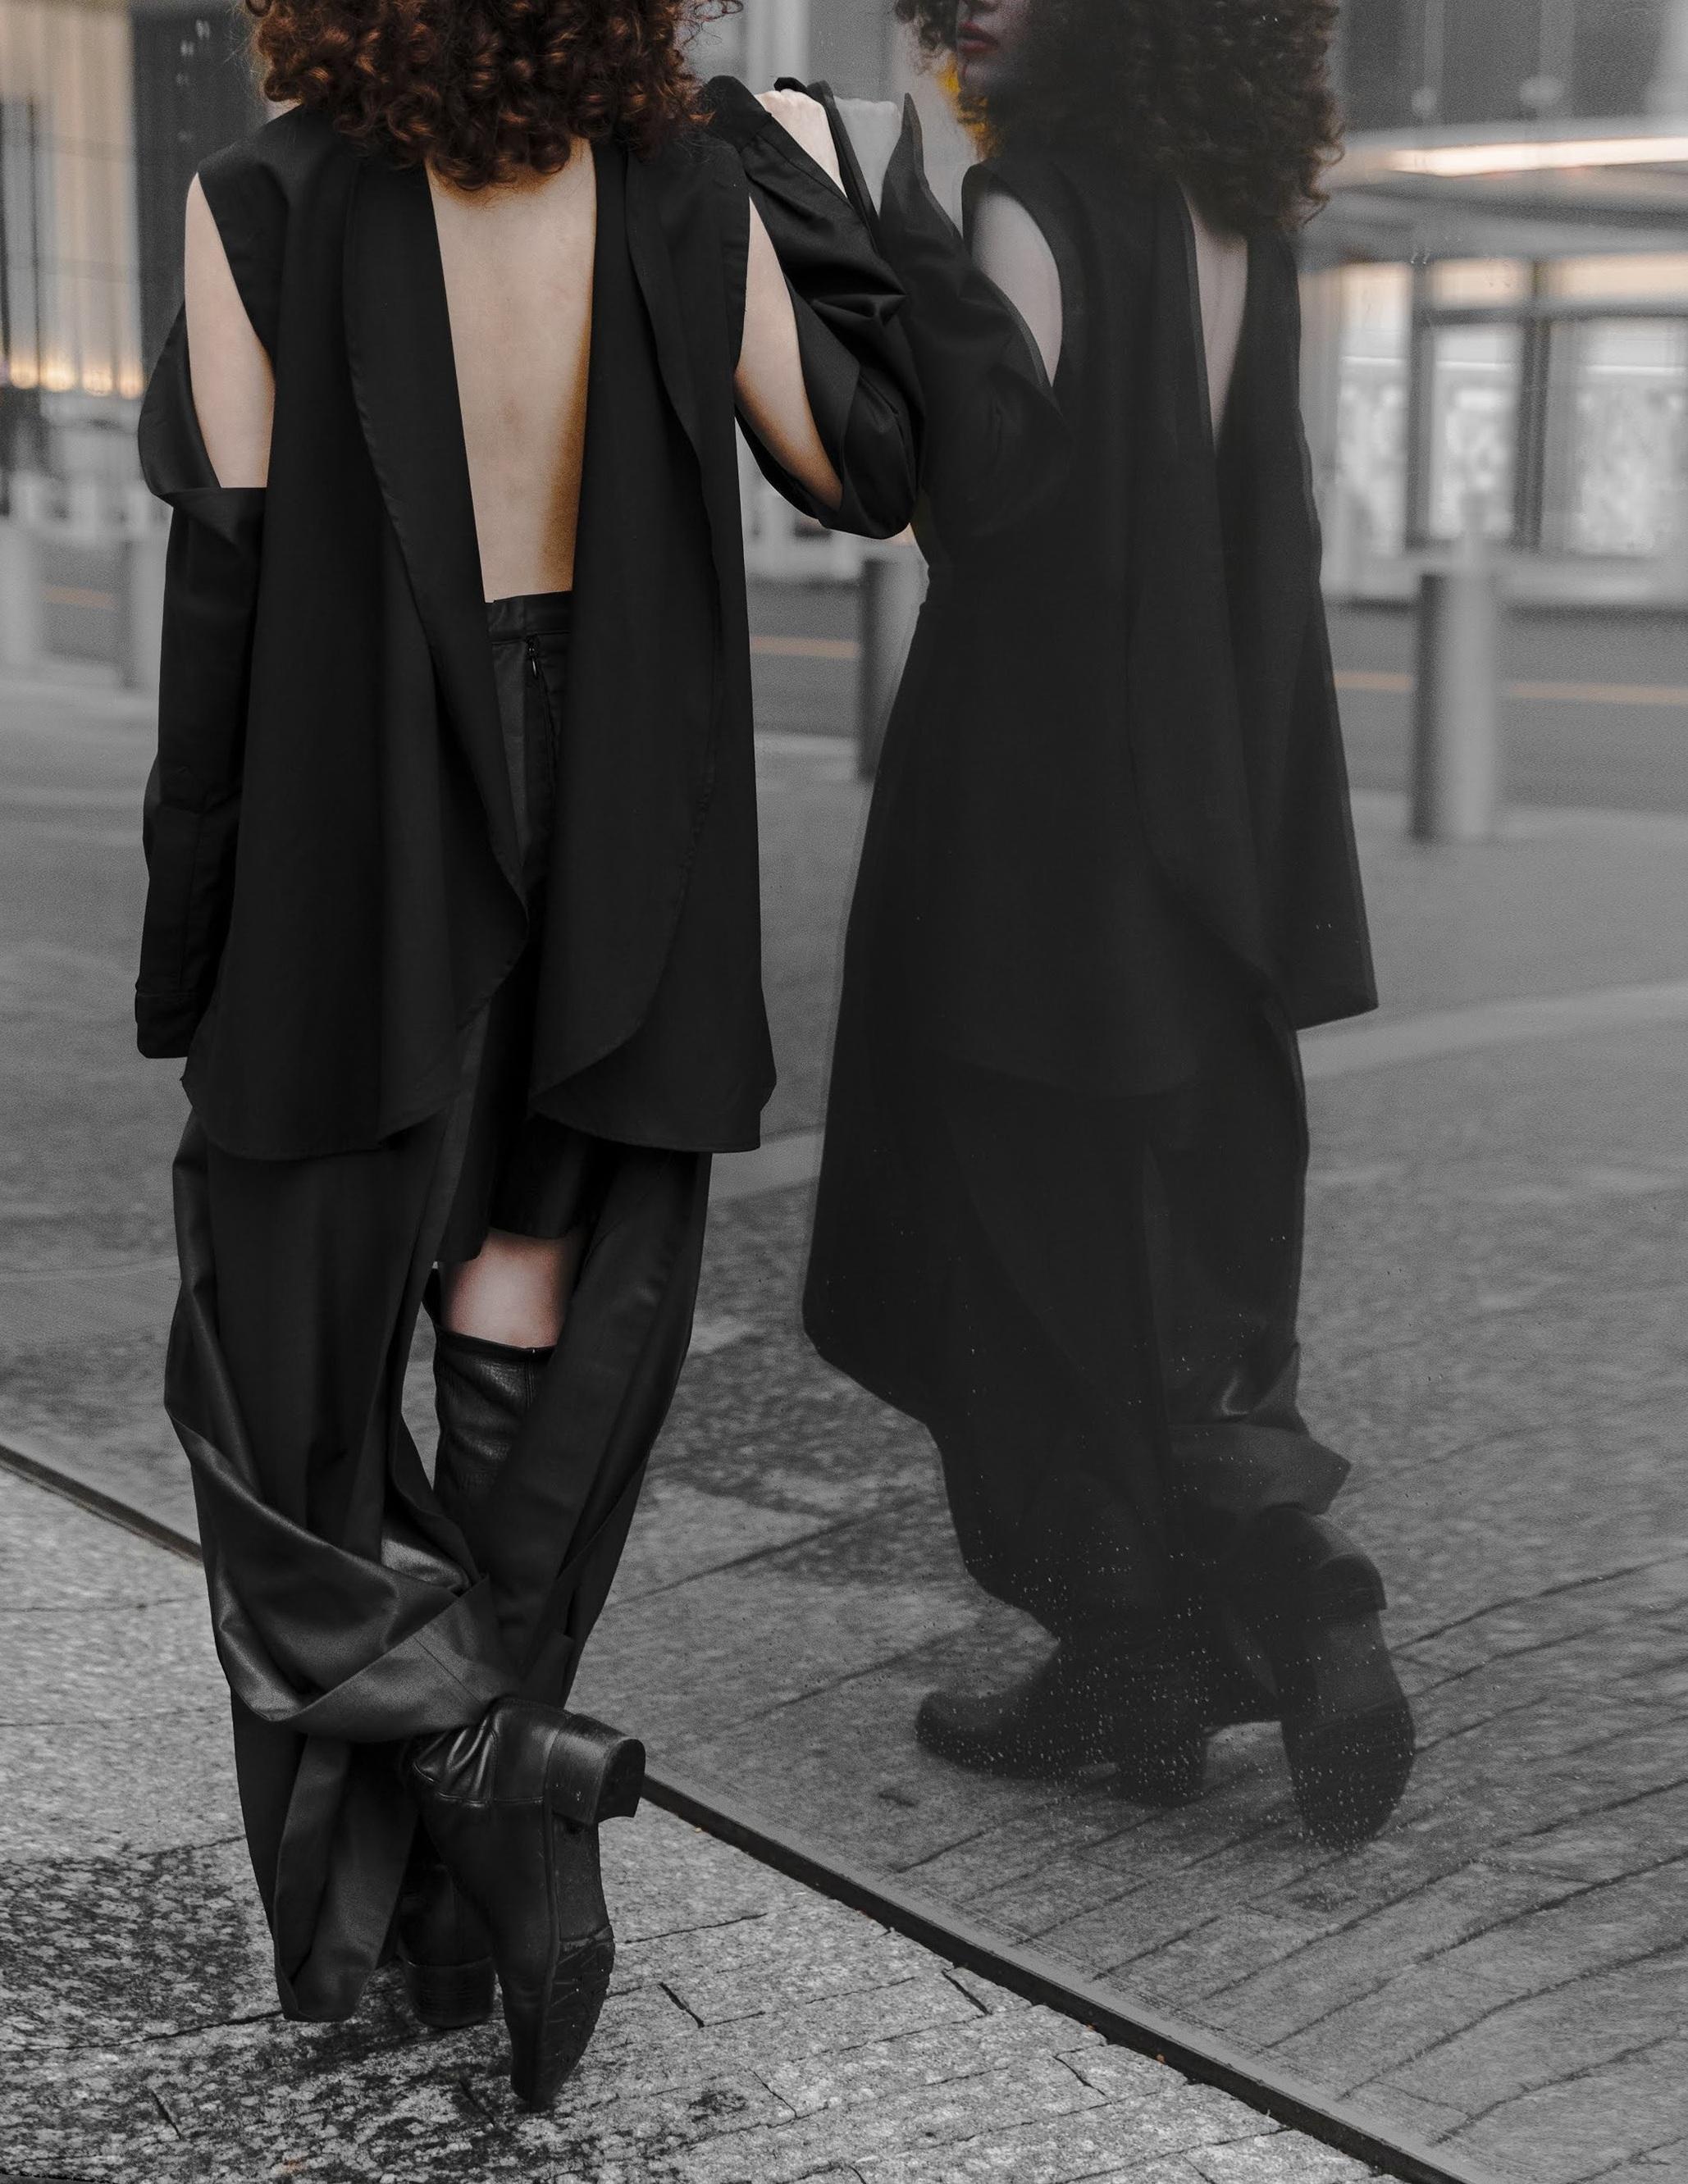 Photographer: Alexandra Marcu  Model: Evangelia Artemis-Gomez